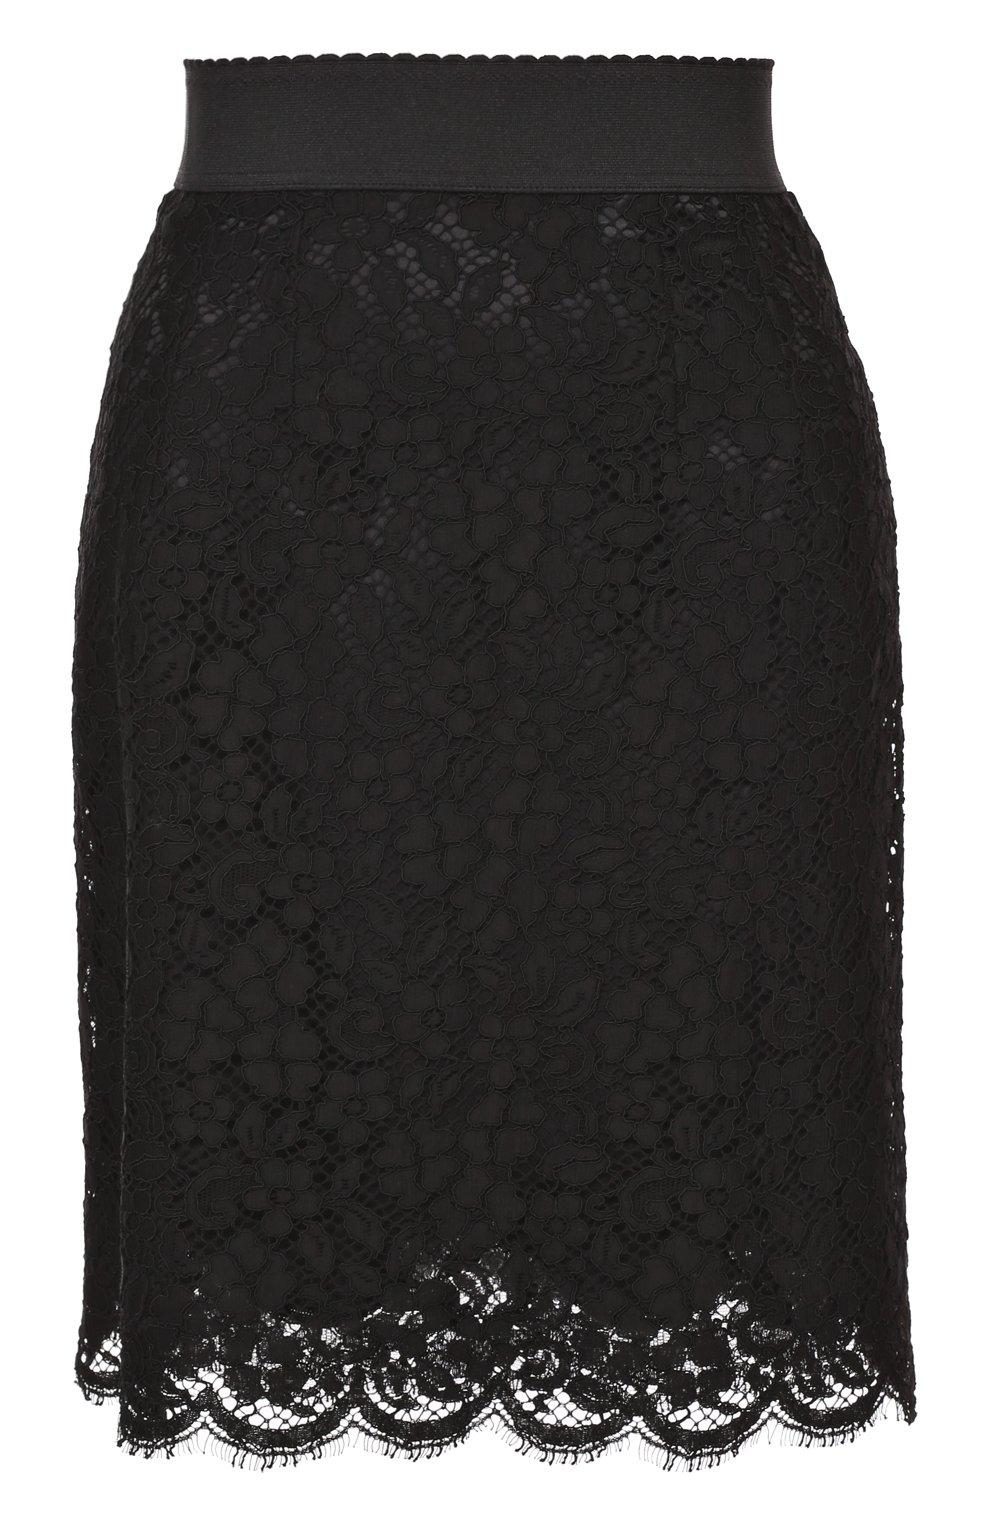 Кружевная мини-юбка с широким поясом | Фото №1